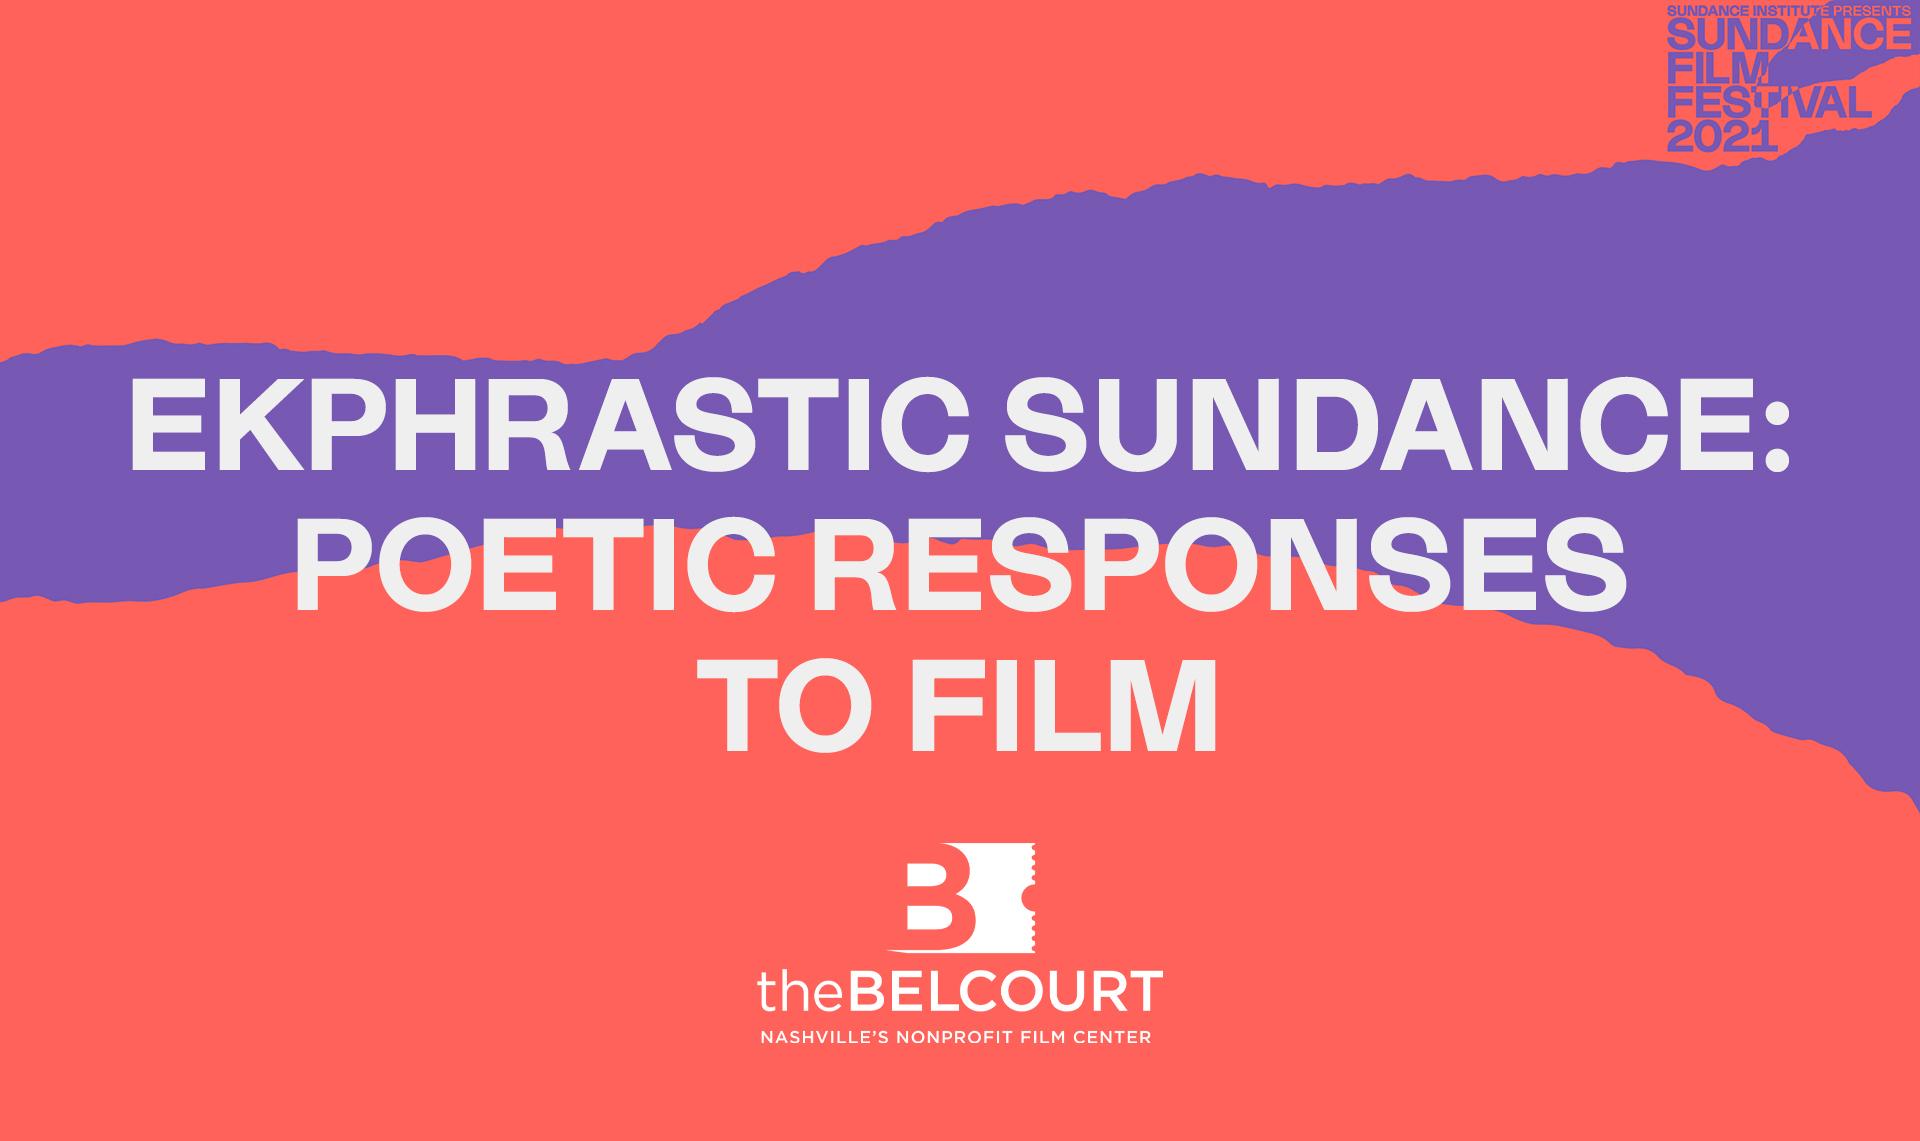 Sundance Beyond Film: Ekphrastic Sundance: Poetic Responses to Film